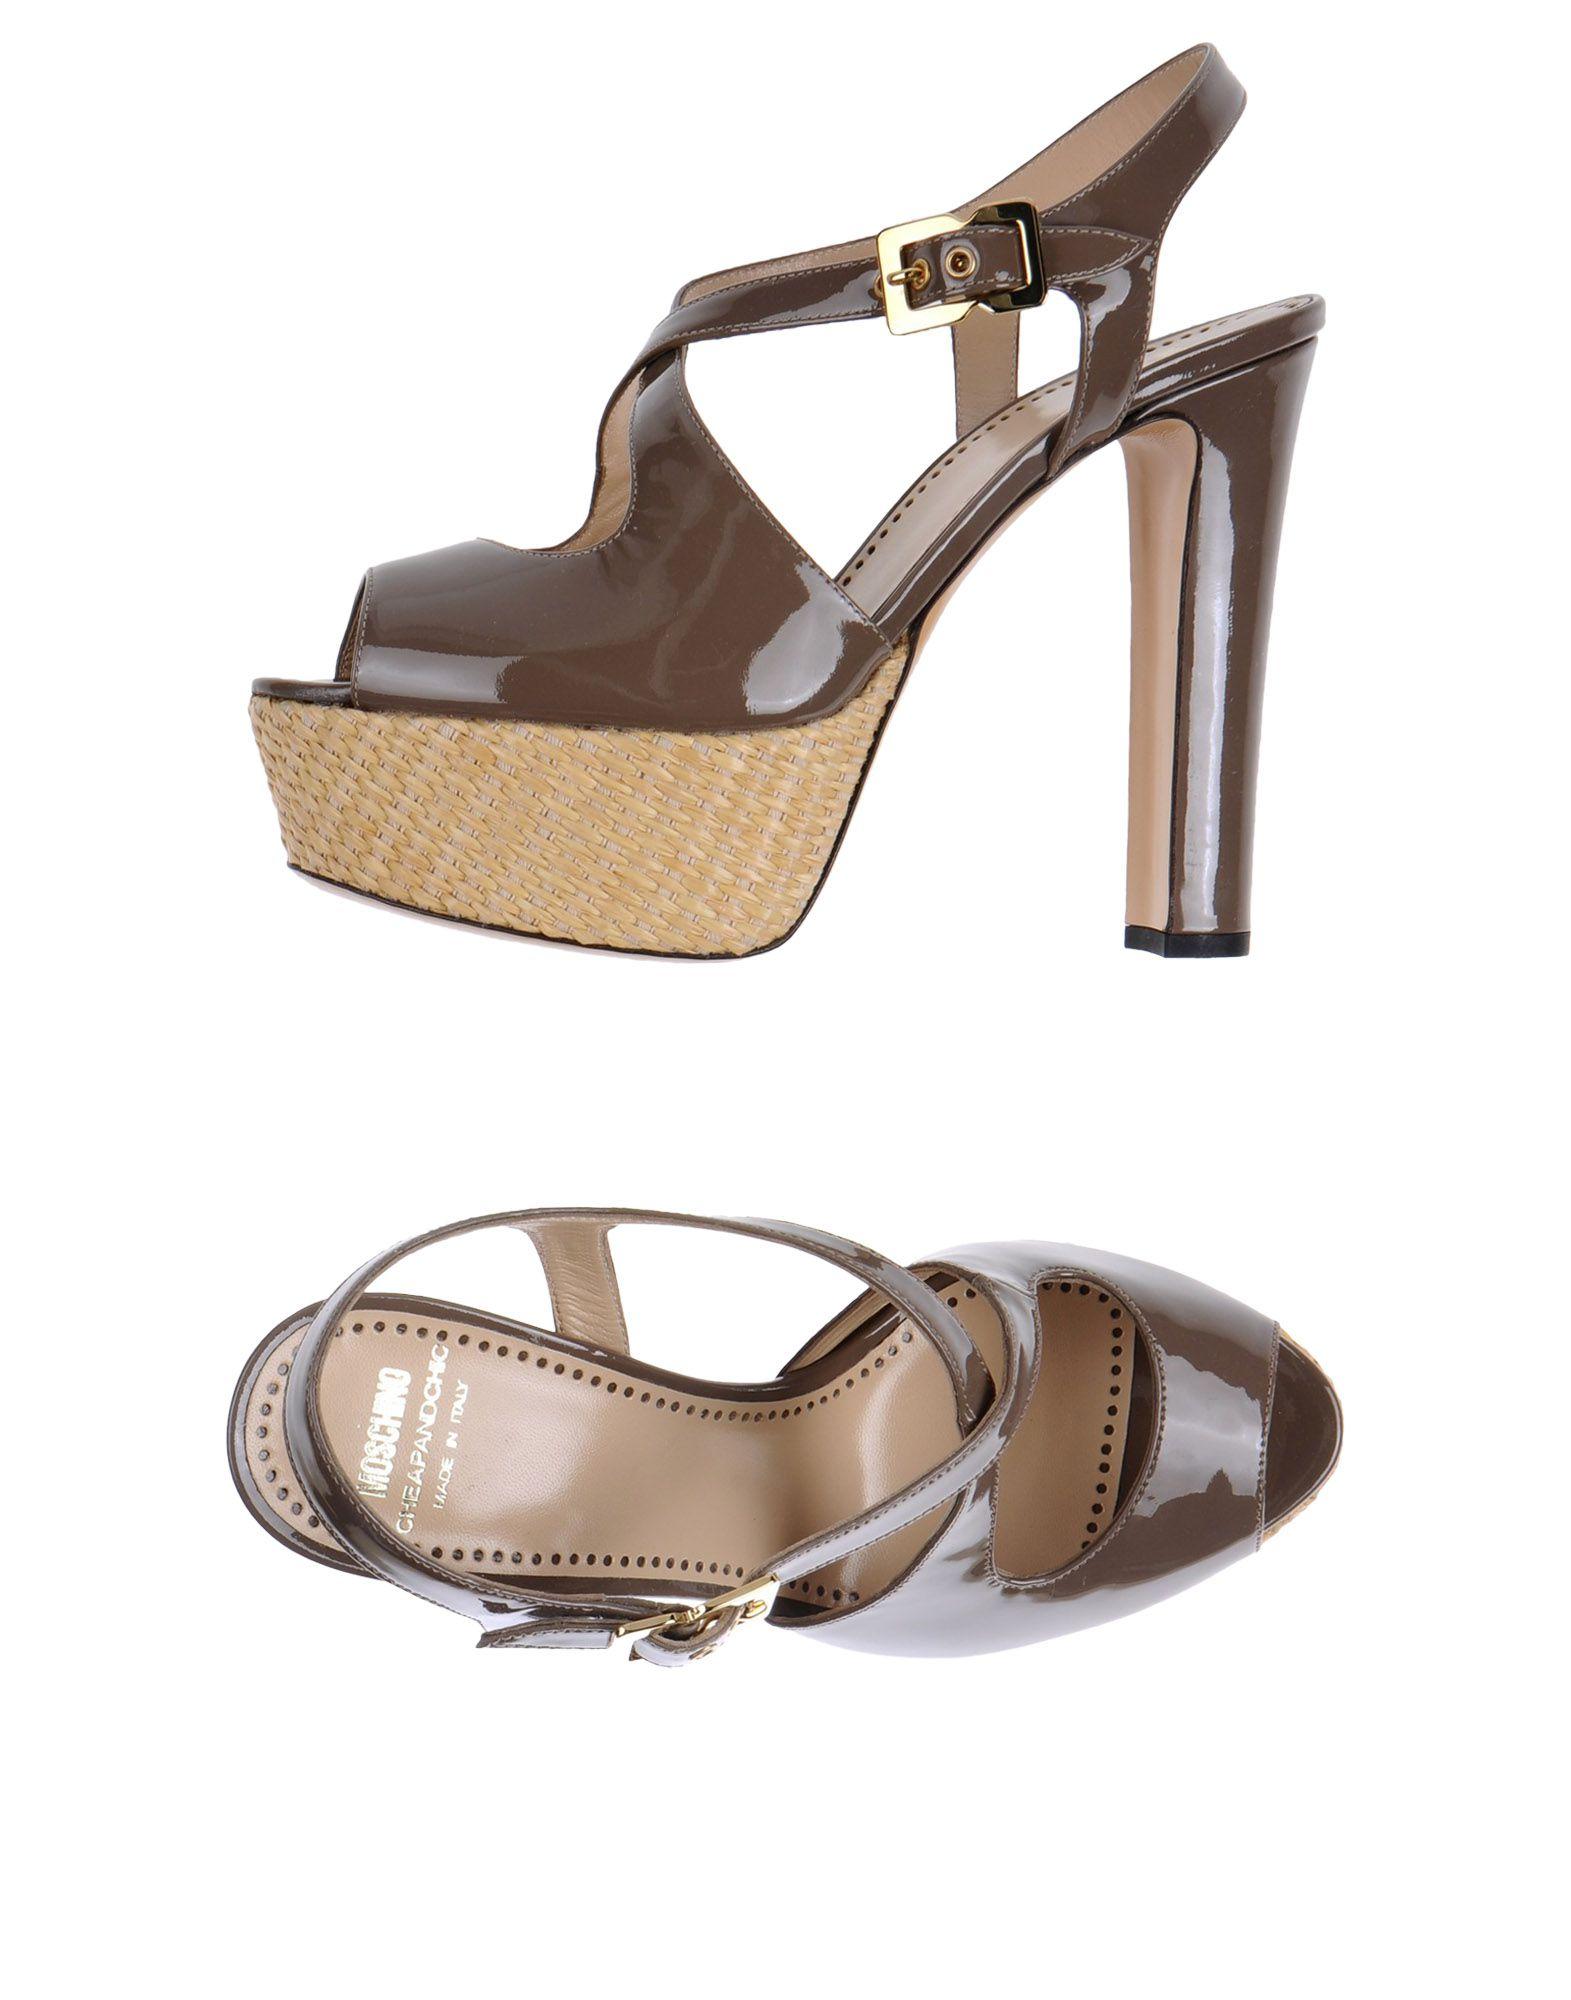 moschino cheap chic high0heel platform sandals in gray